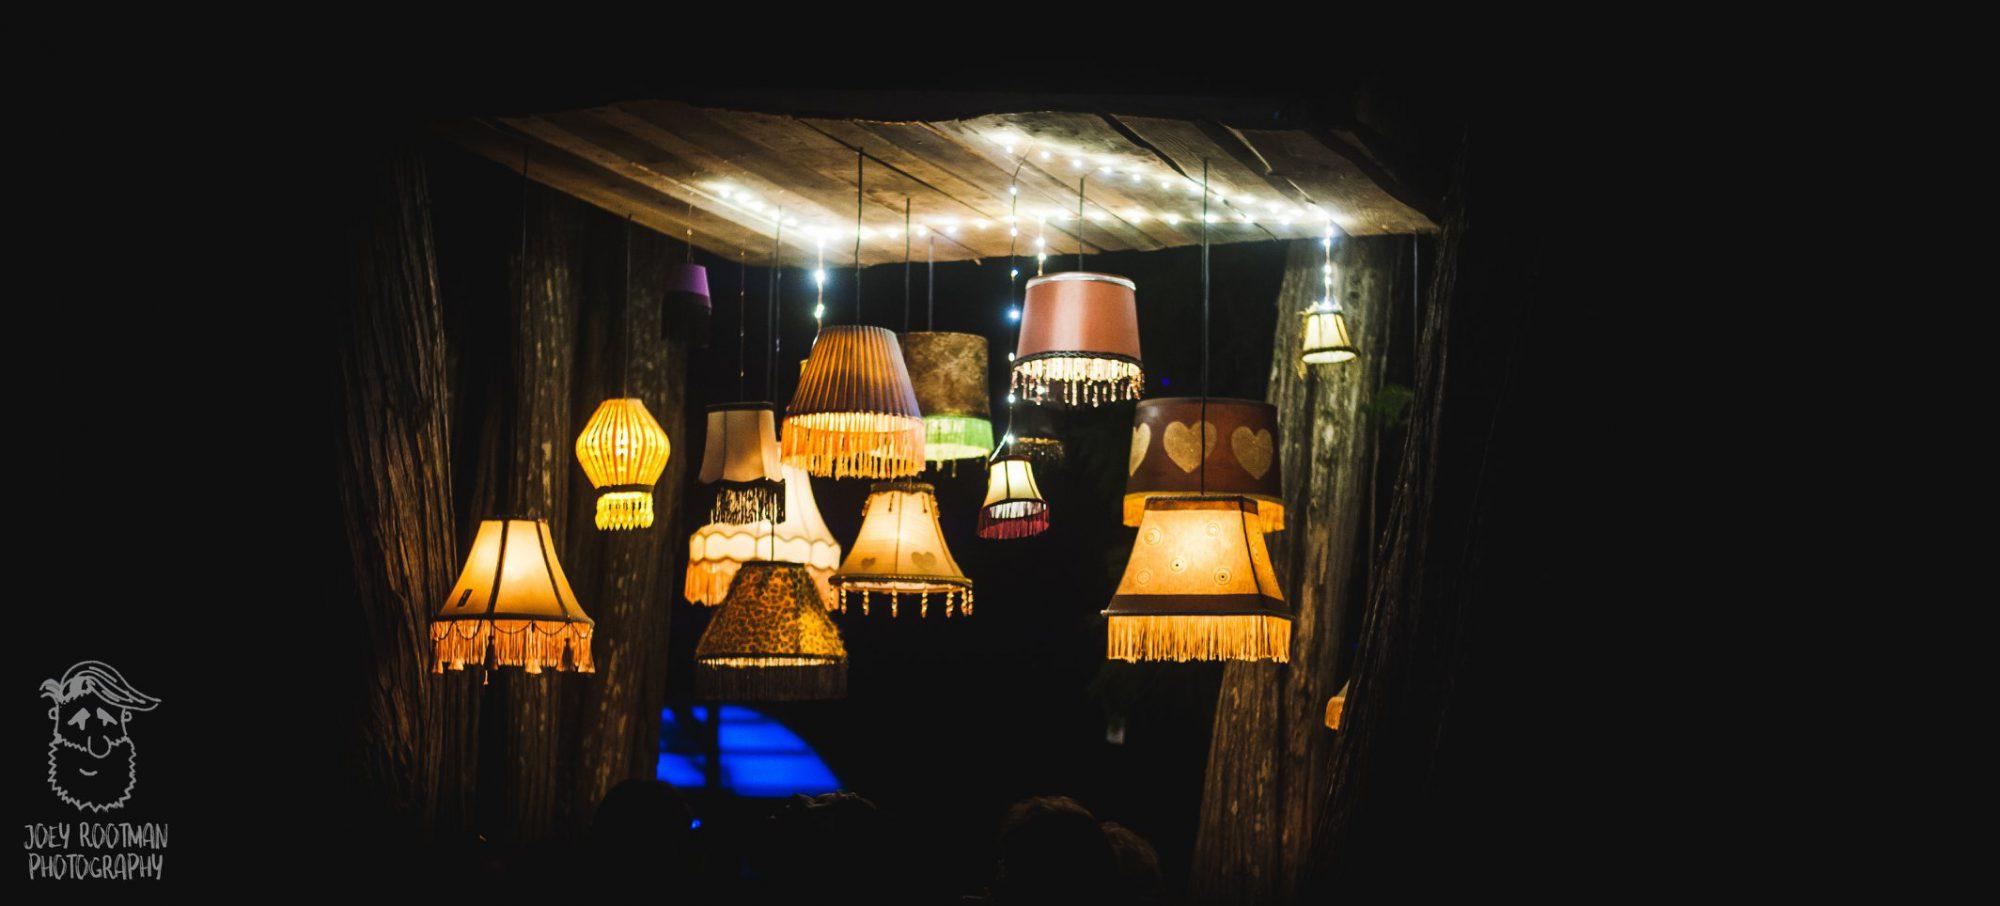 Shambhala 2018 The Living Room Lamps